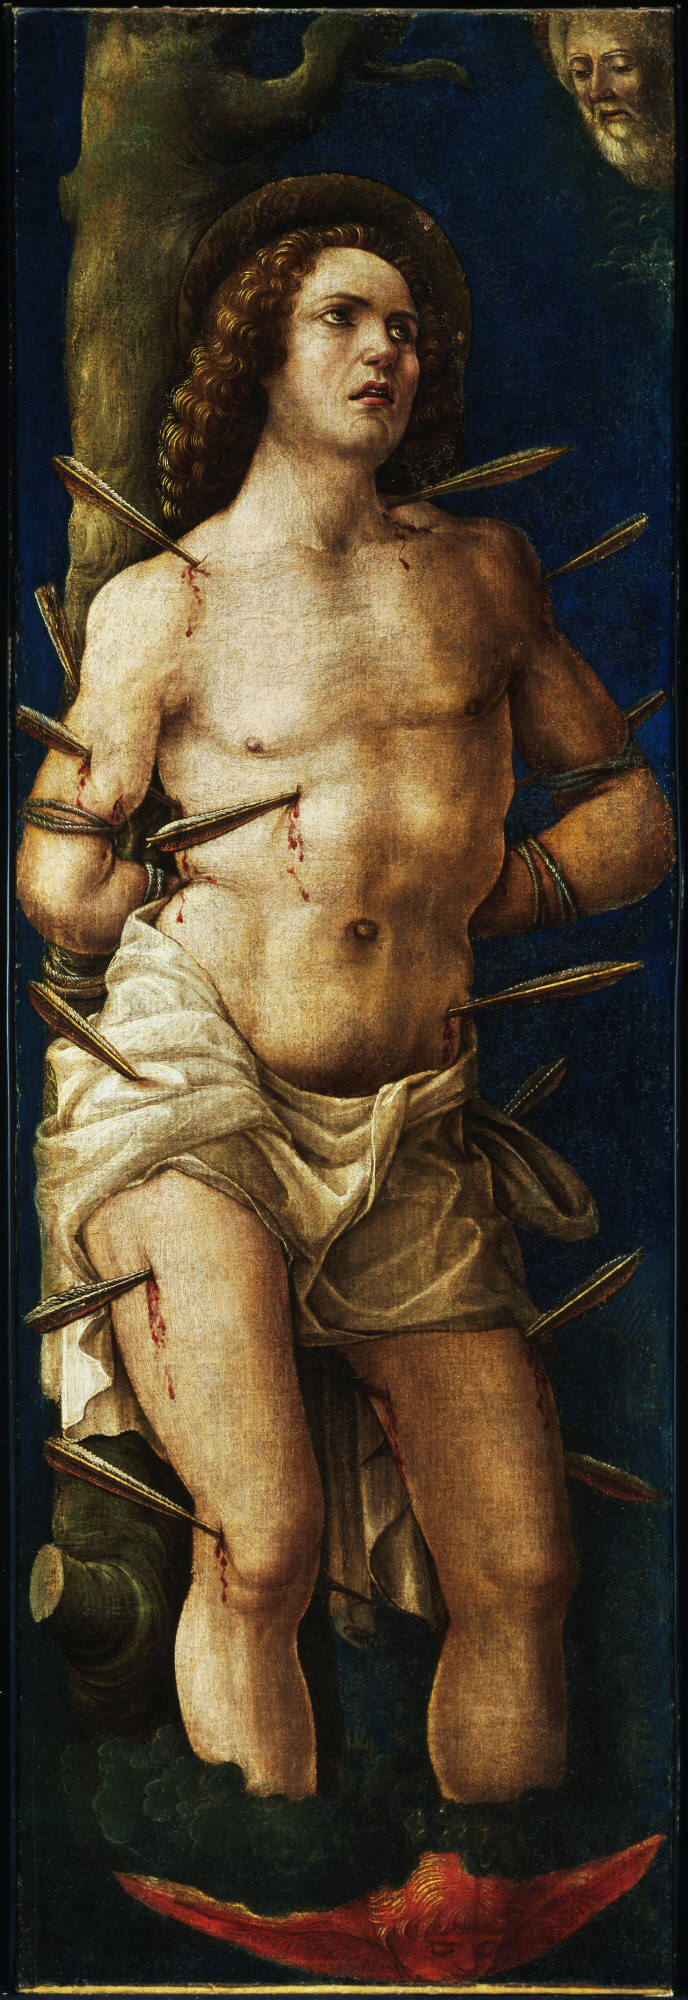 St. Sebastian by Liberale da Verona Princeton U Art Museum